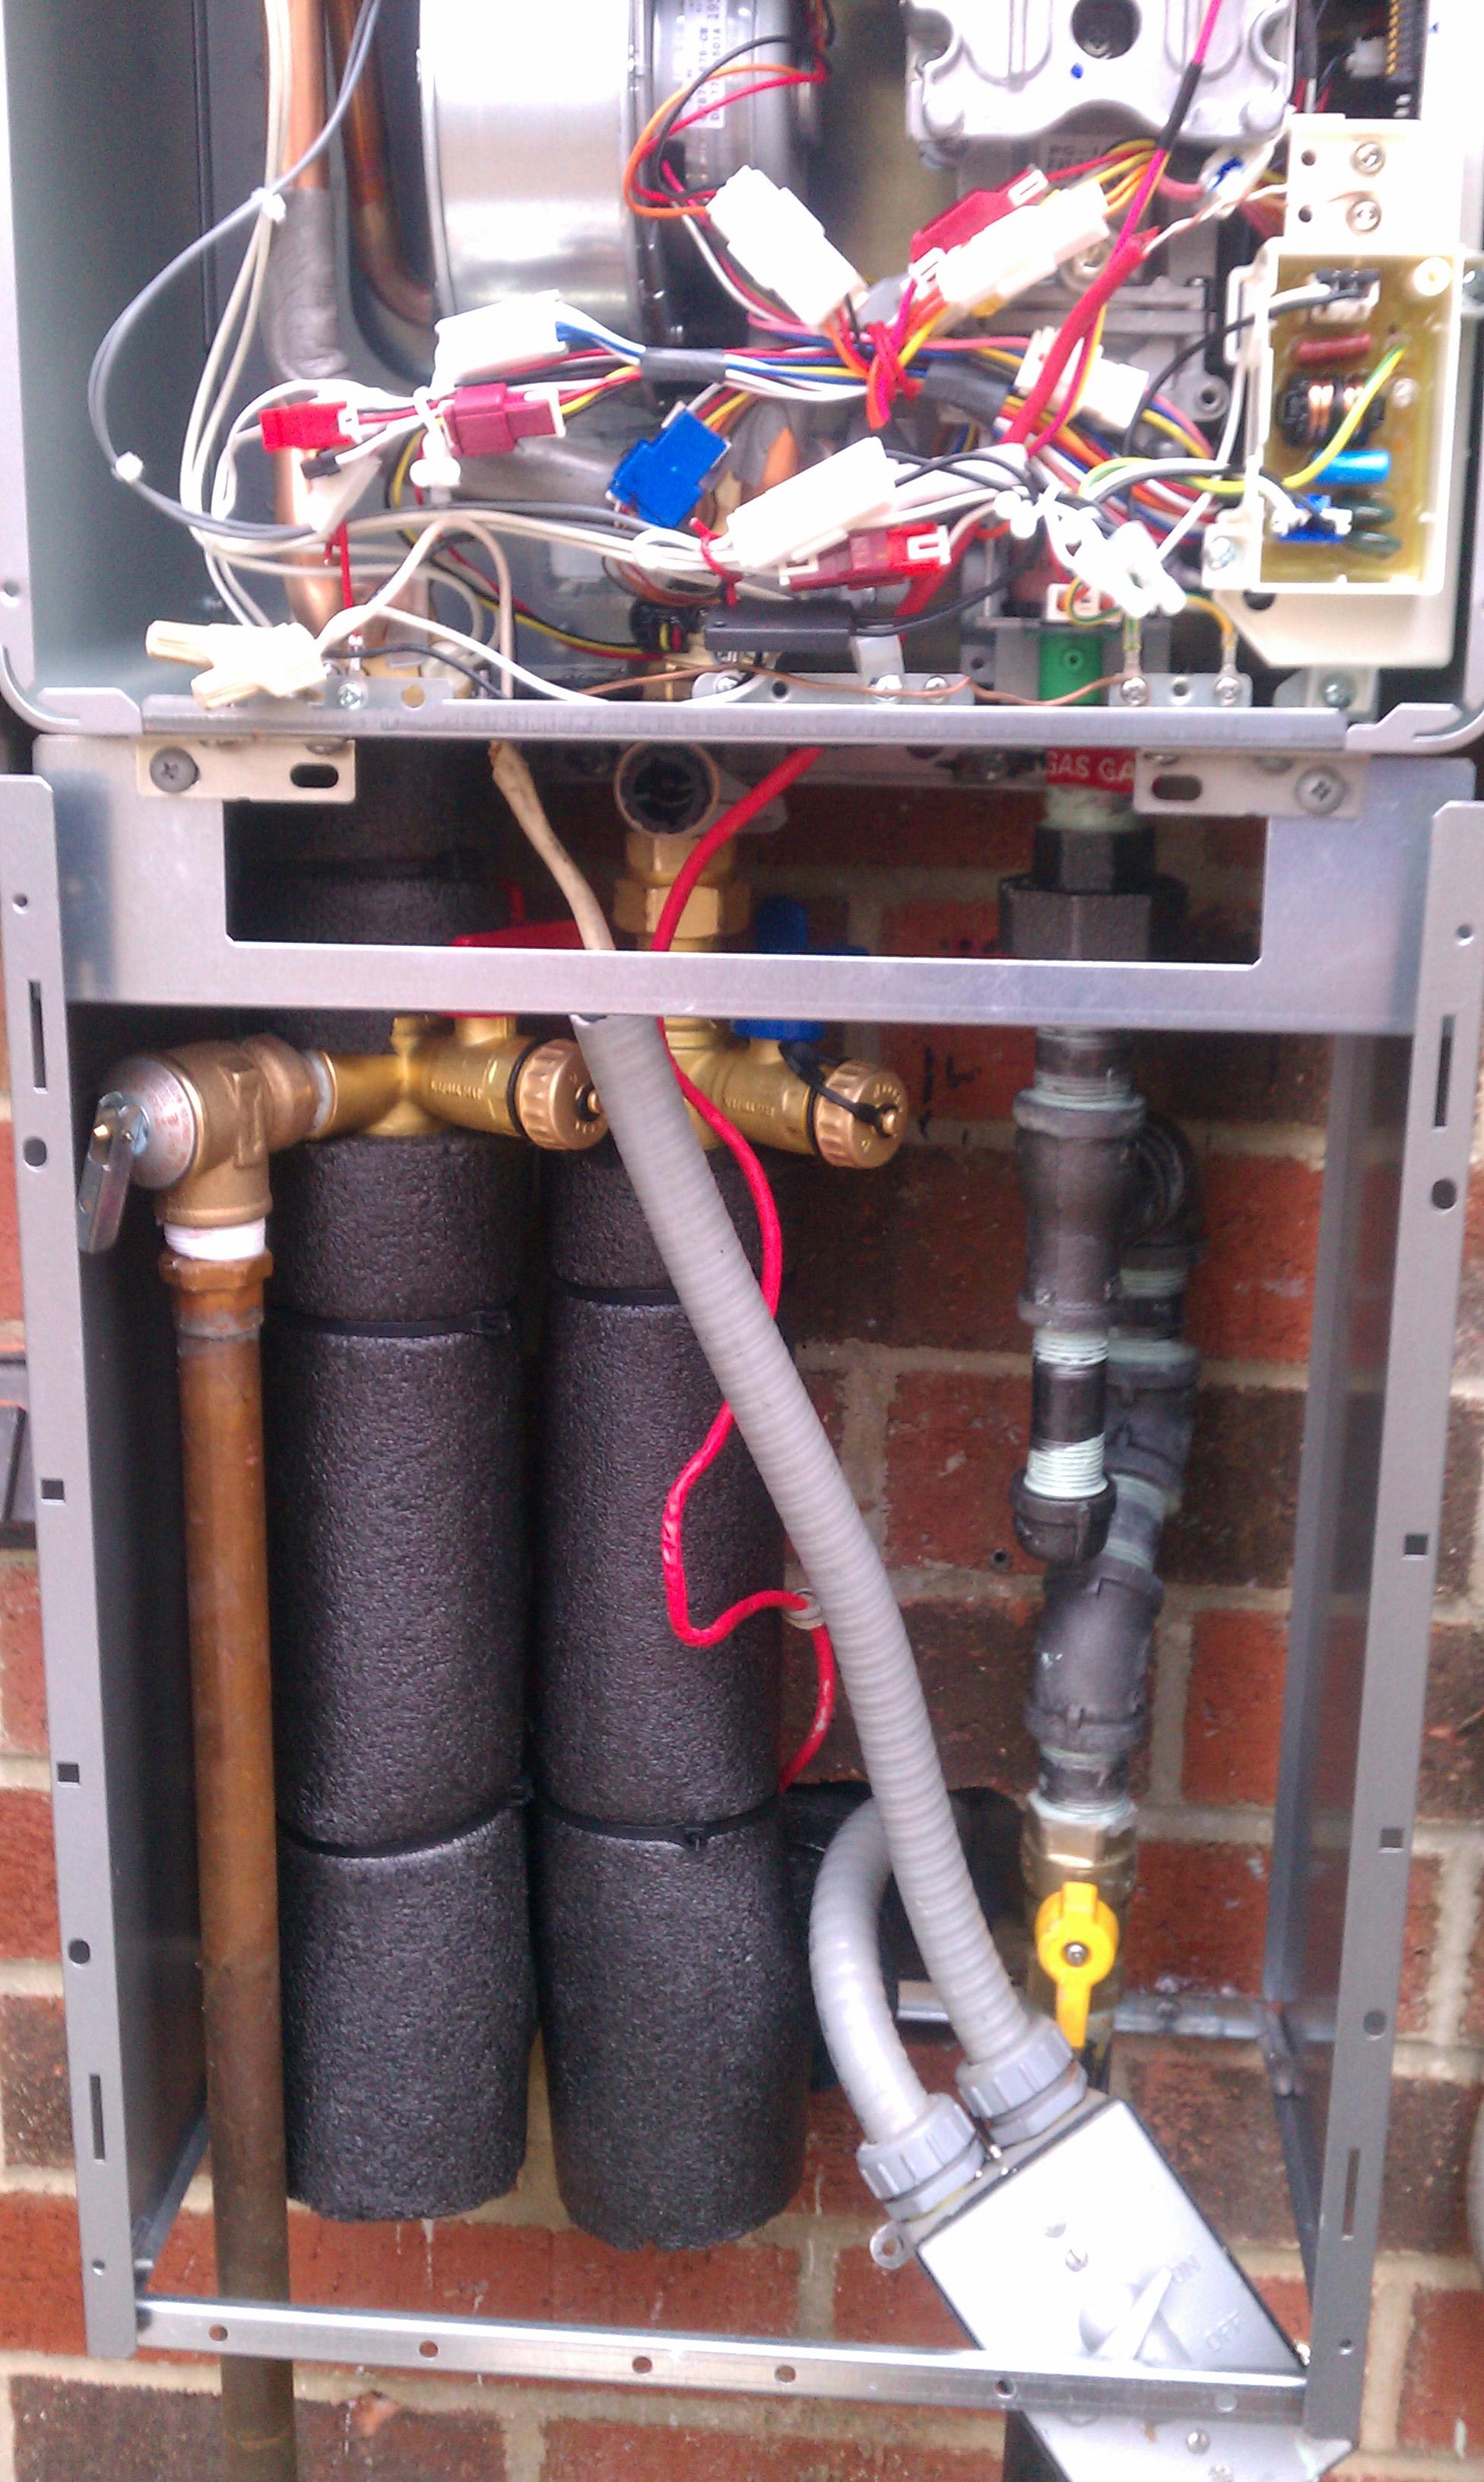 rinnai tankless water heater troubleshooting rinnai tankless water heater troubleshooting tankless water heater repair raleigh error codes rinnai raleigh